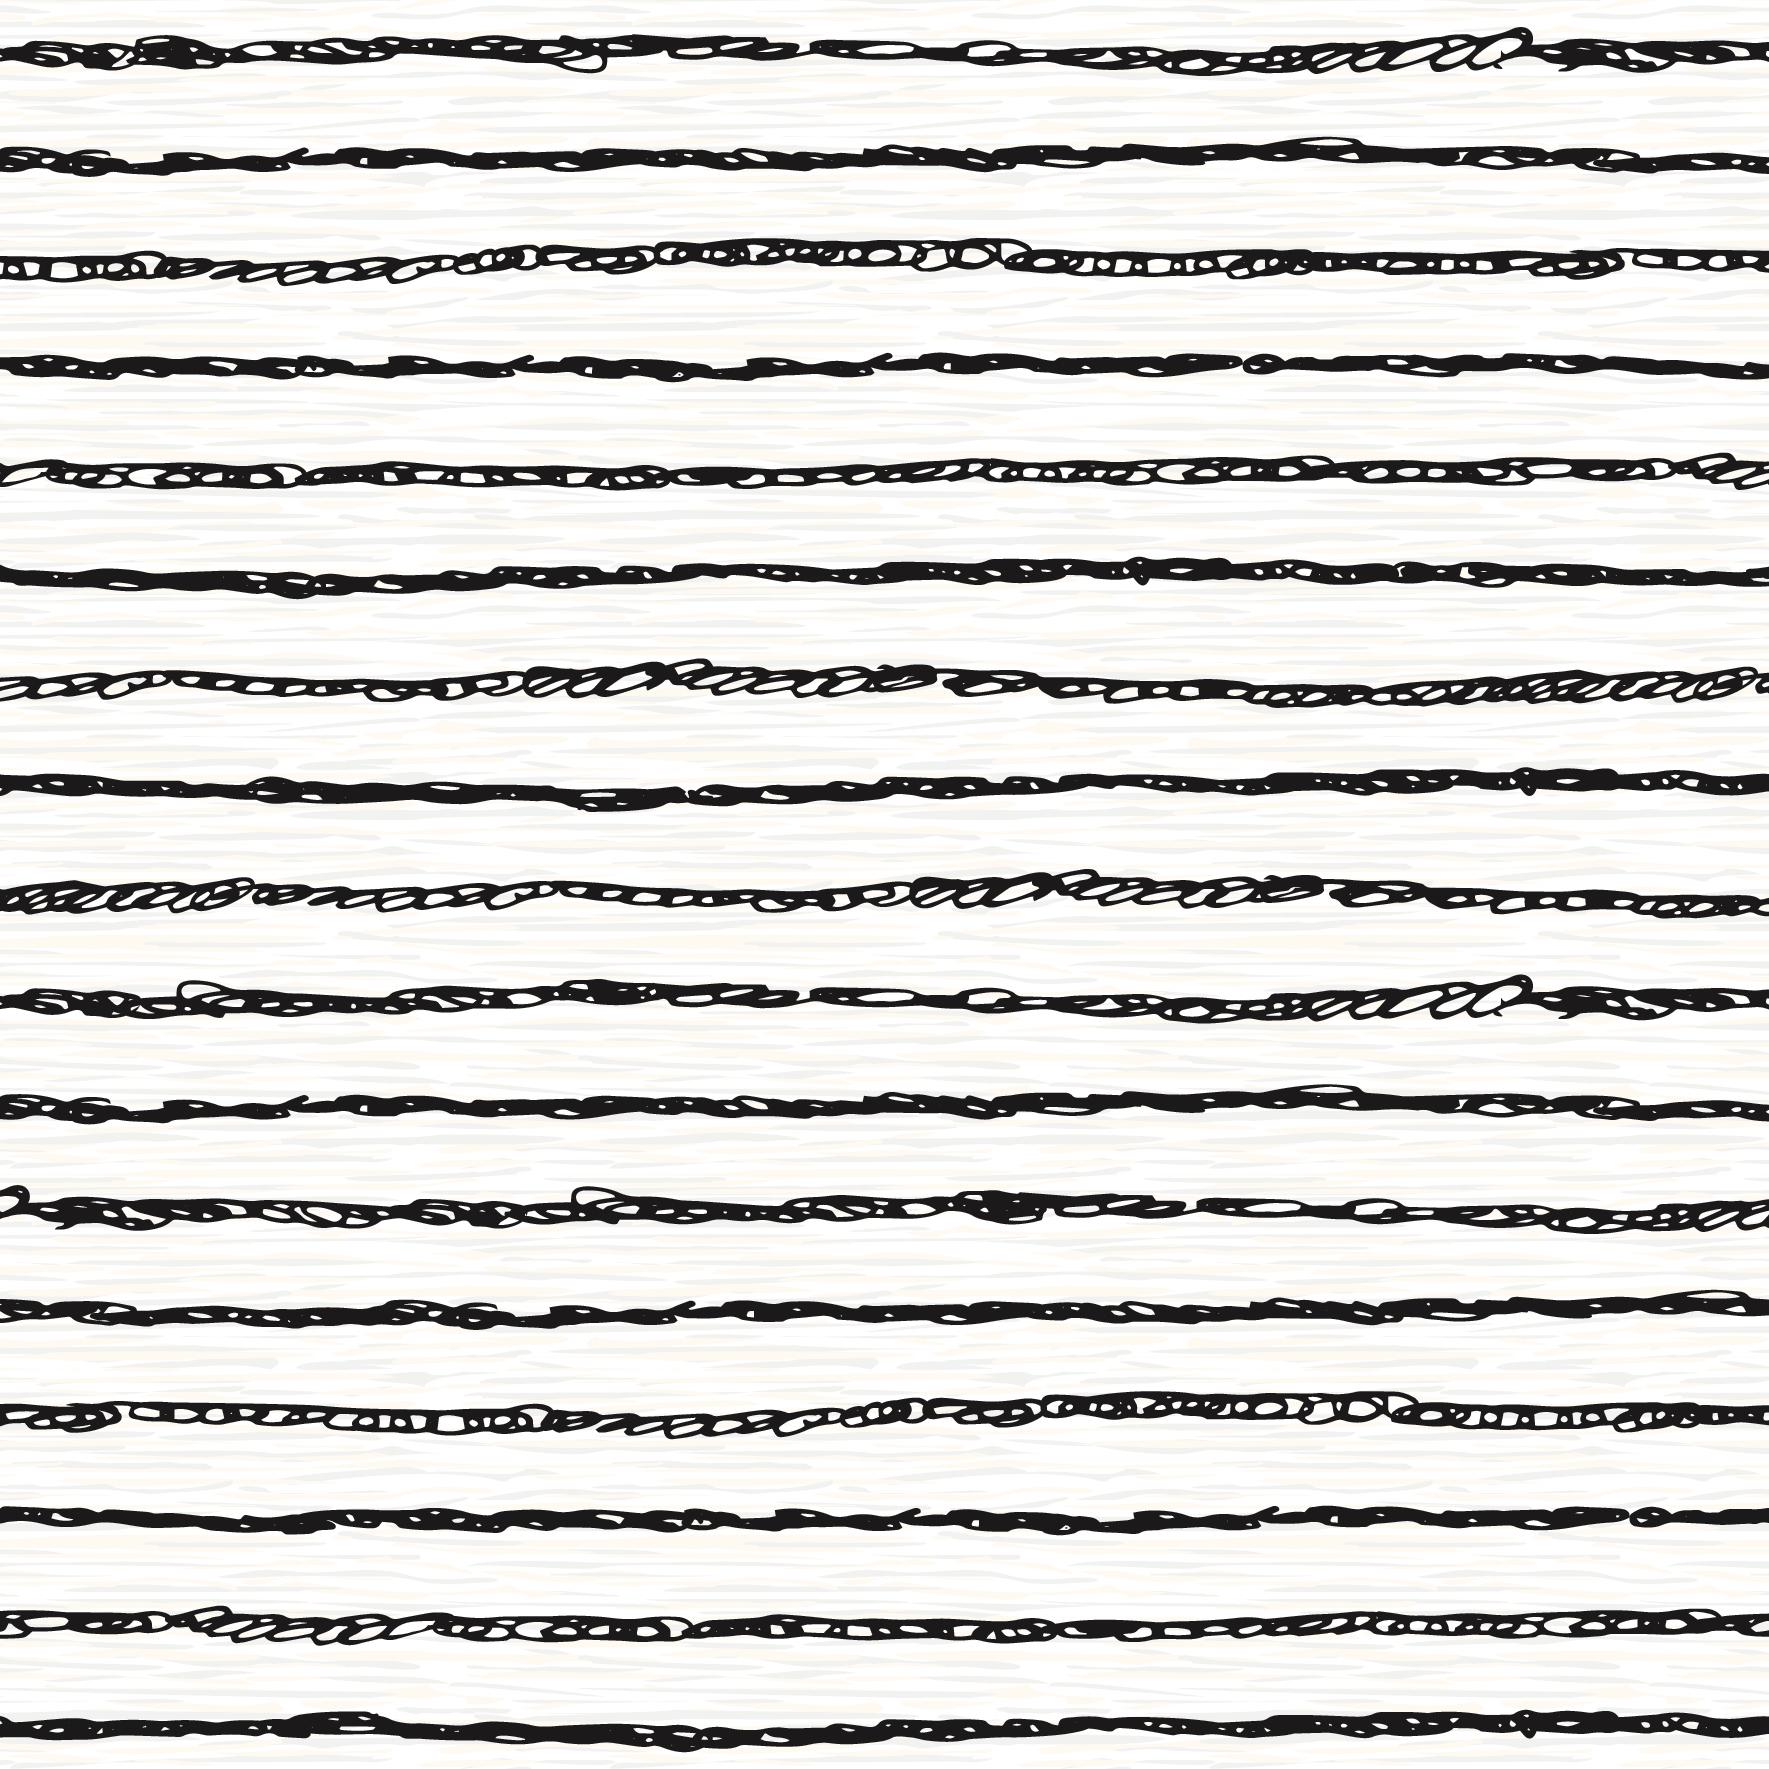 Squiggly Stripe-S314-01.jpg